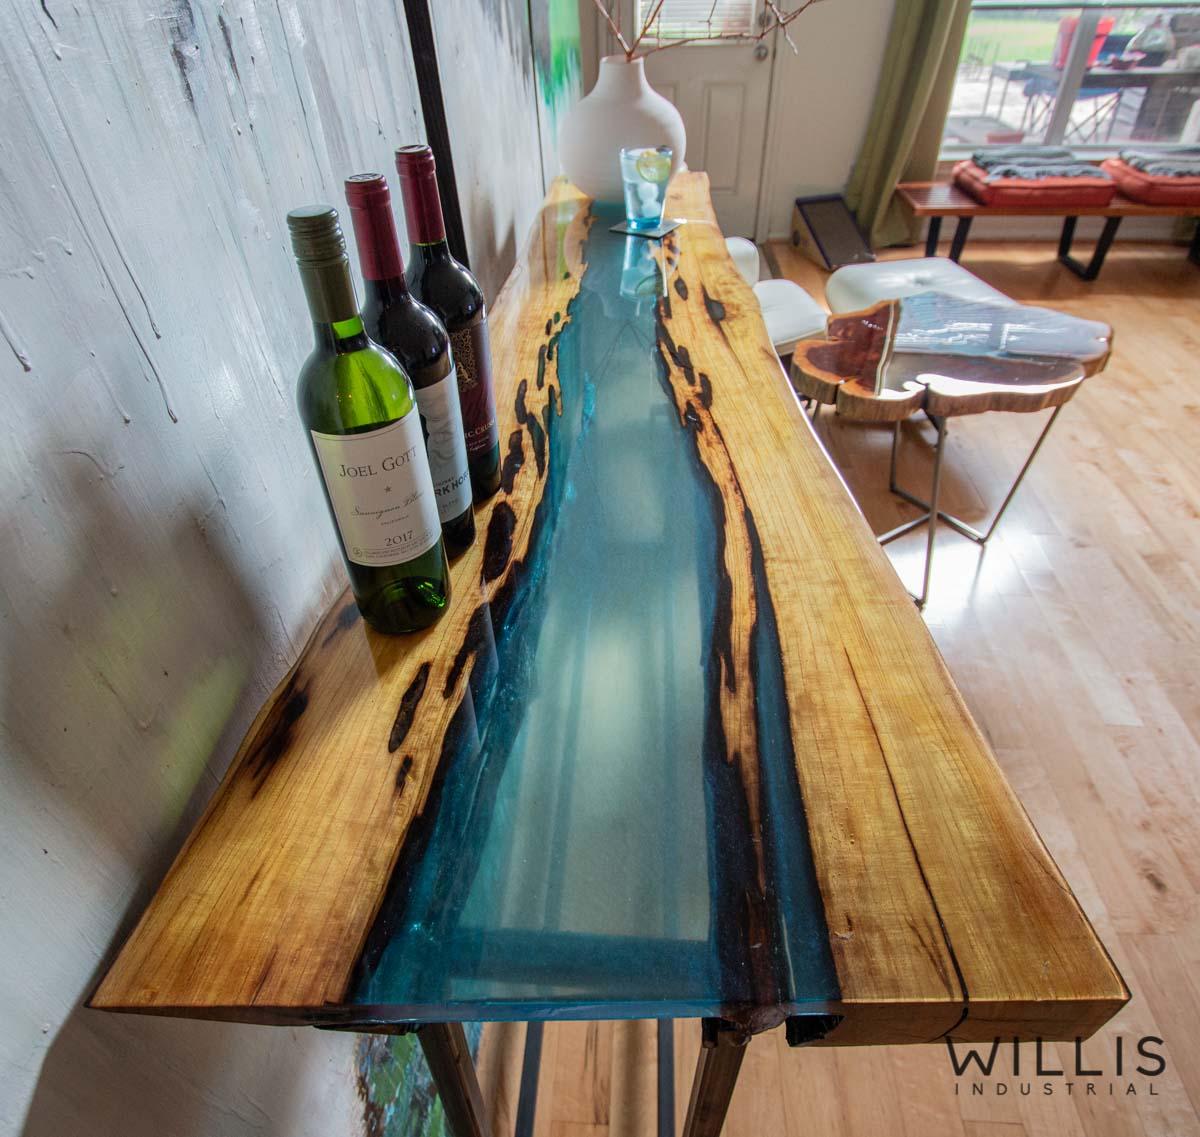 Willis Industrial Furniture | Rustic, Modern Furniture | Mulberry Live Edge with Blue Transparent Metallic Epoxy & Custom Steel Base